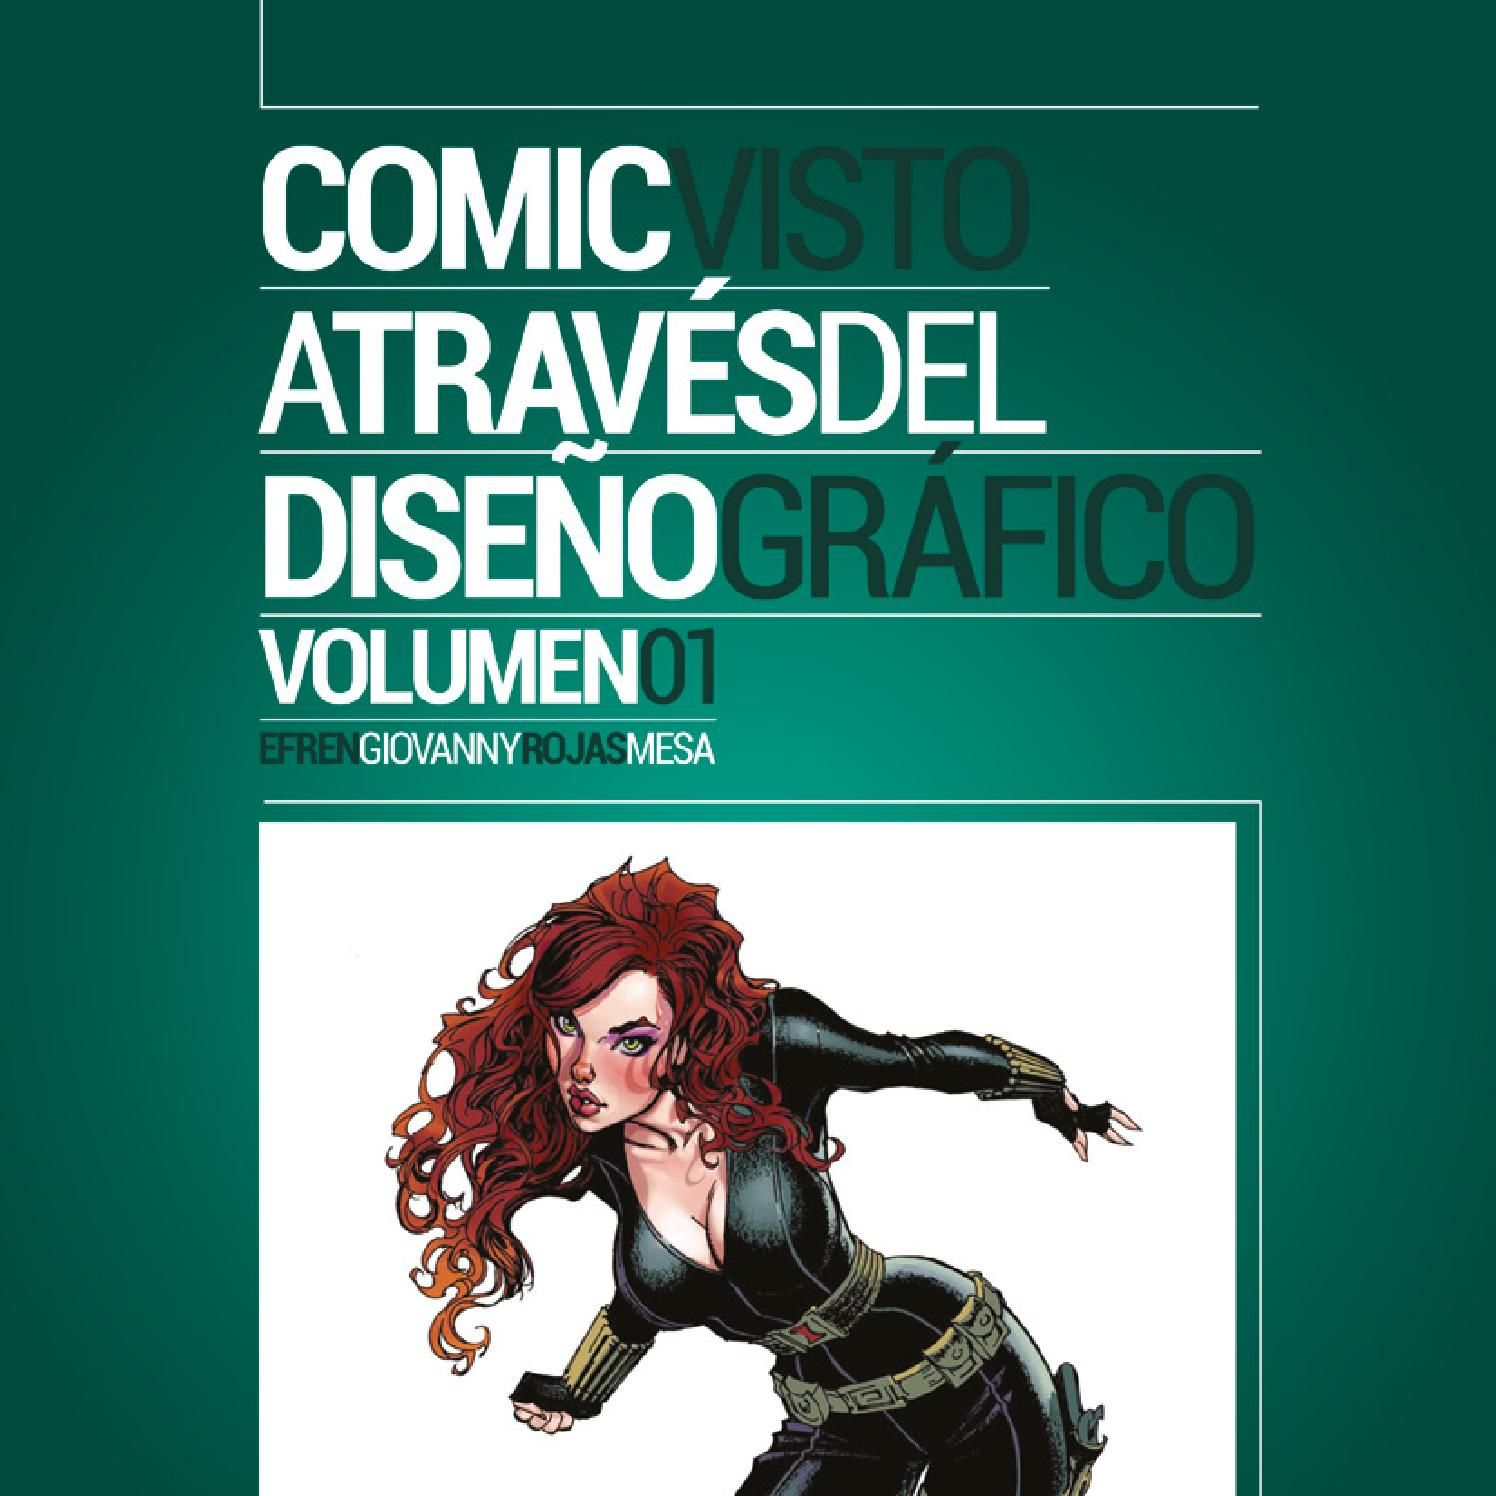 Comic Visto A Traves Del Diseno Grafico Libros De Dibujo Pdf Aprende A Dibujar Comic Paginas Para Dibujar